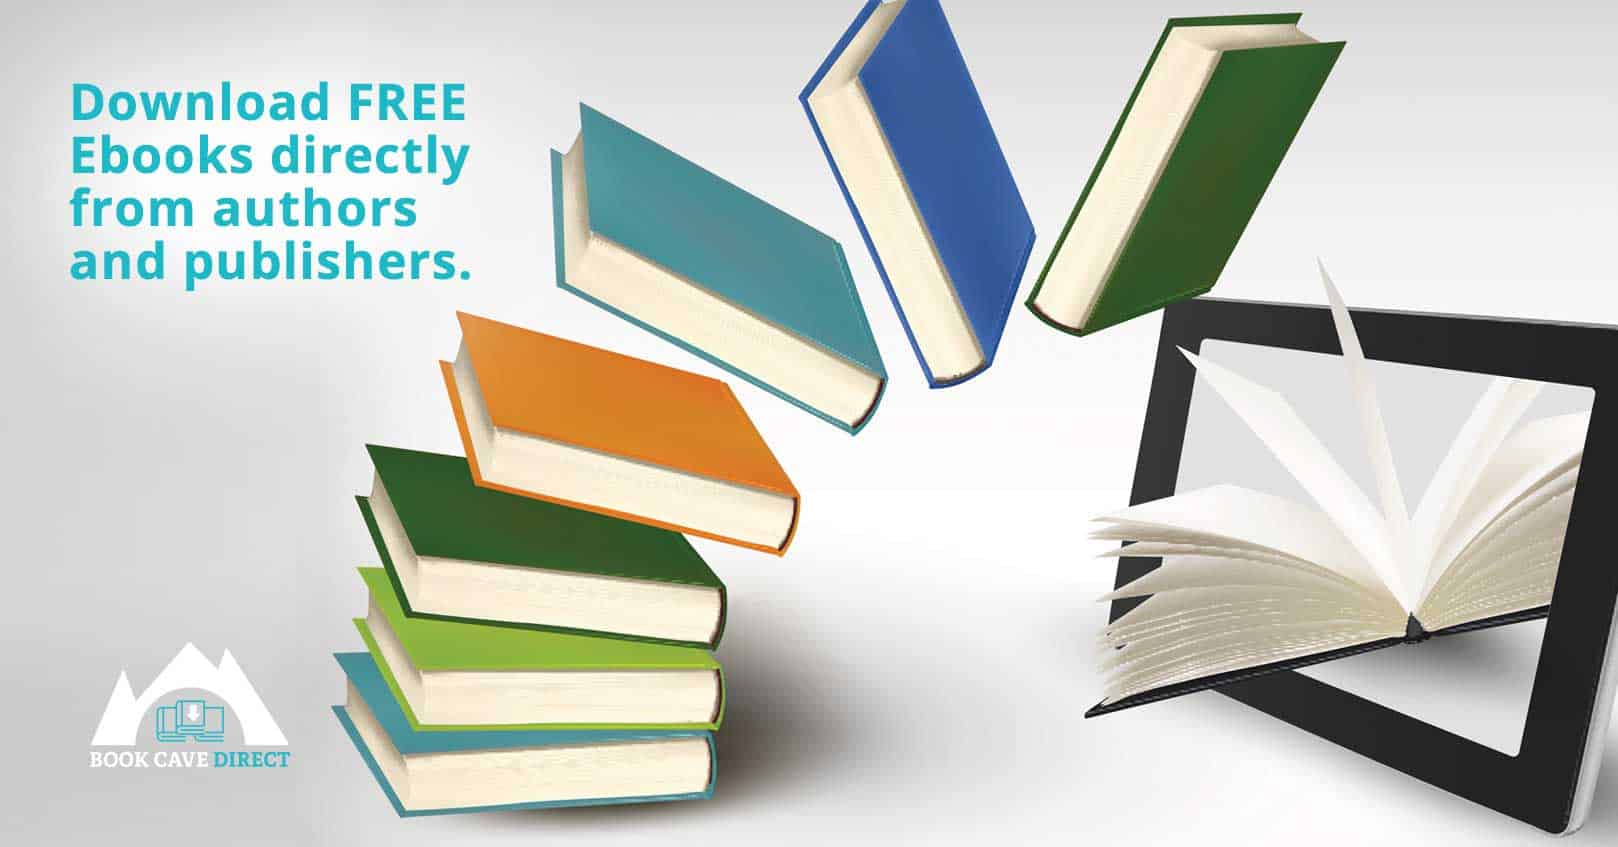 FREE EBOOKS DIRECT EPUB